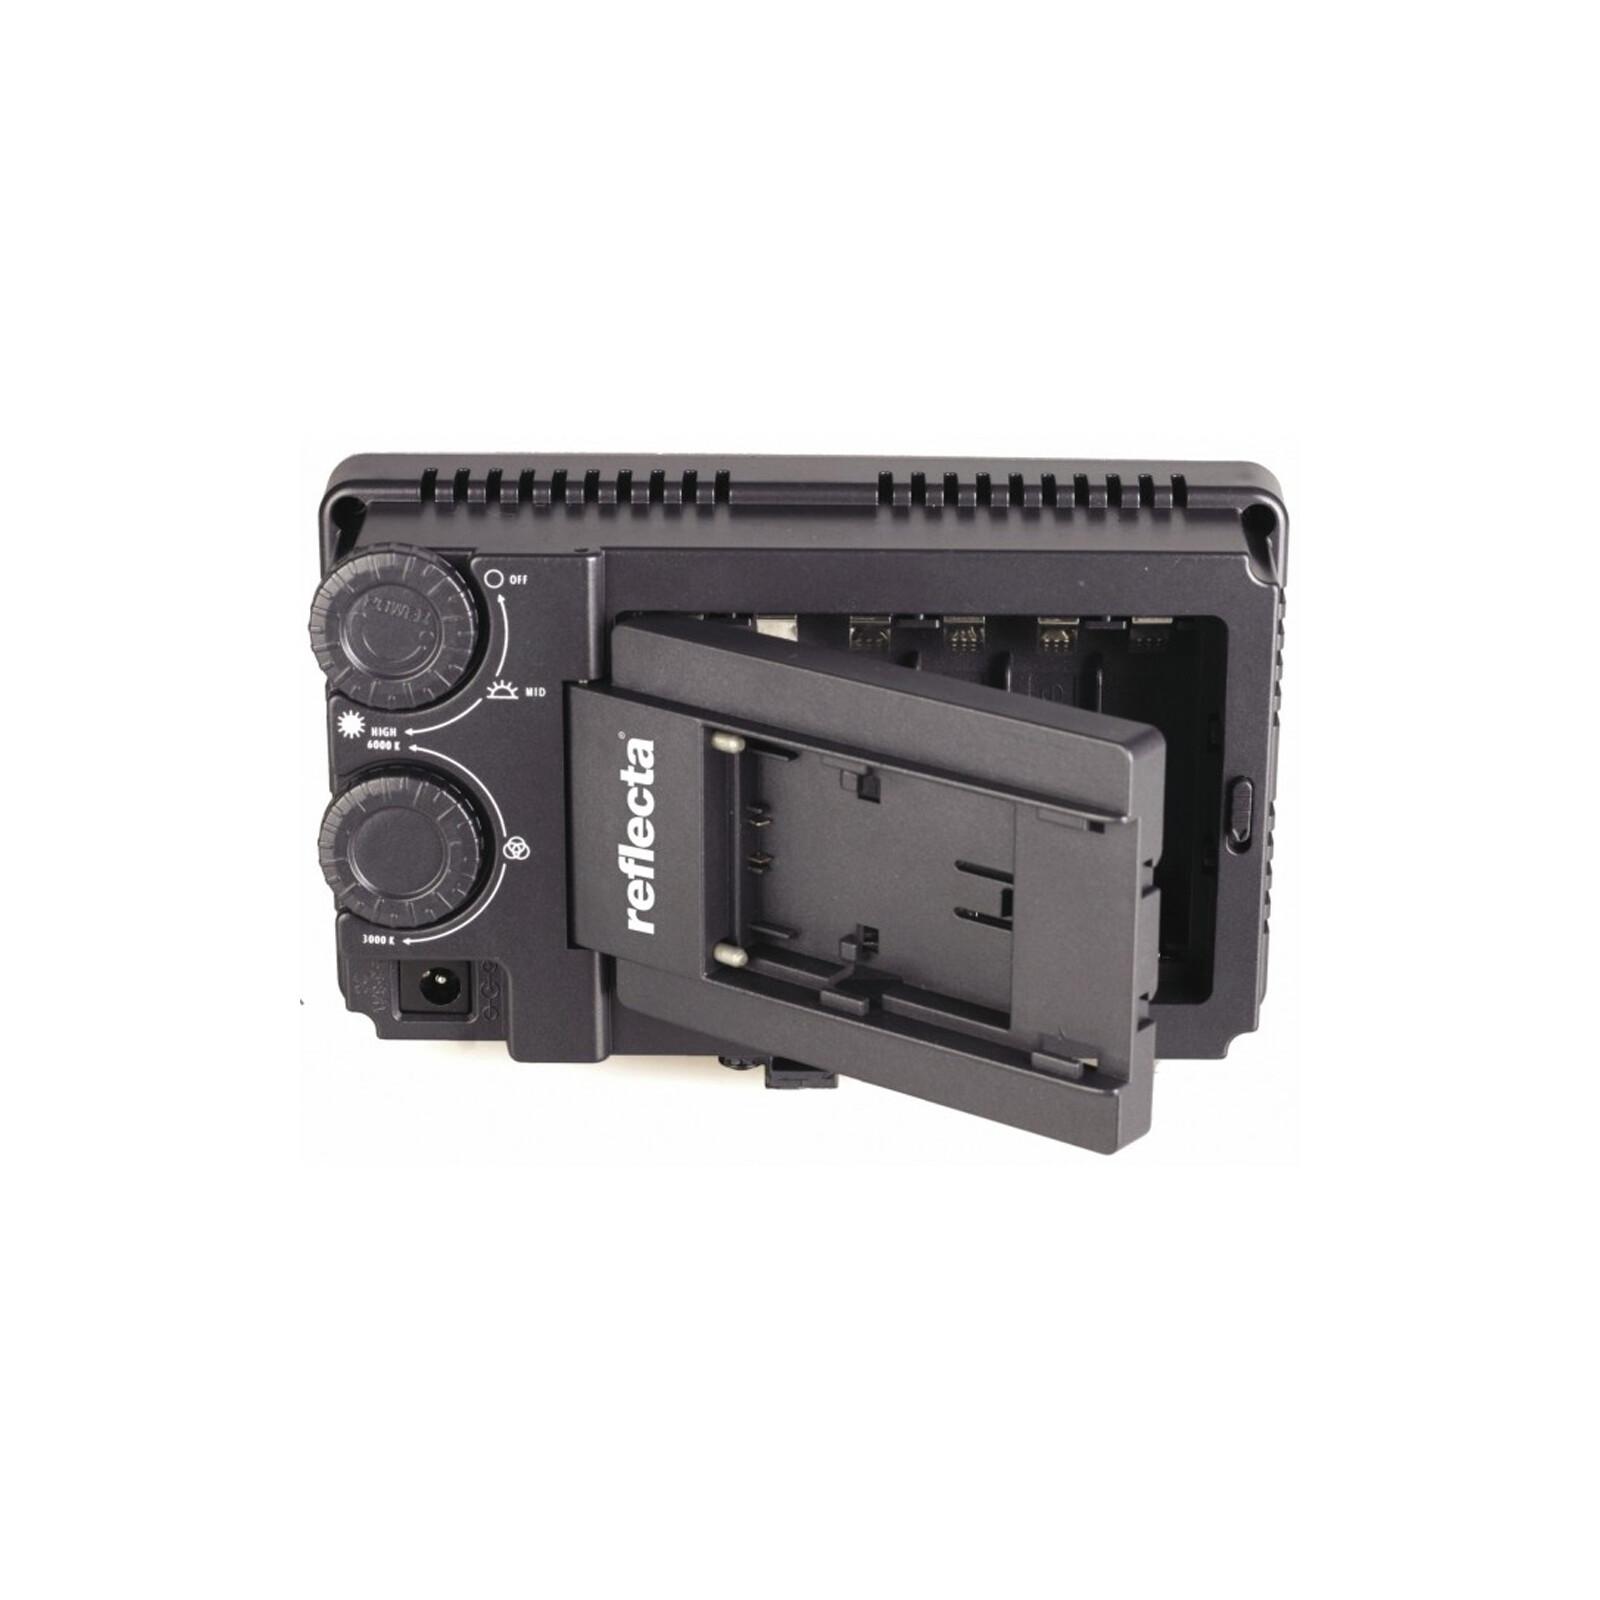 Reflecta RPL-210 VCT LED Videoleuchte